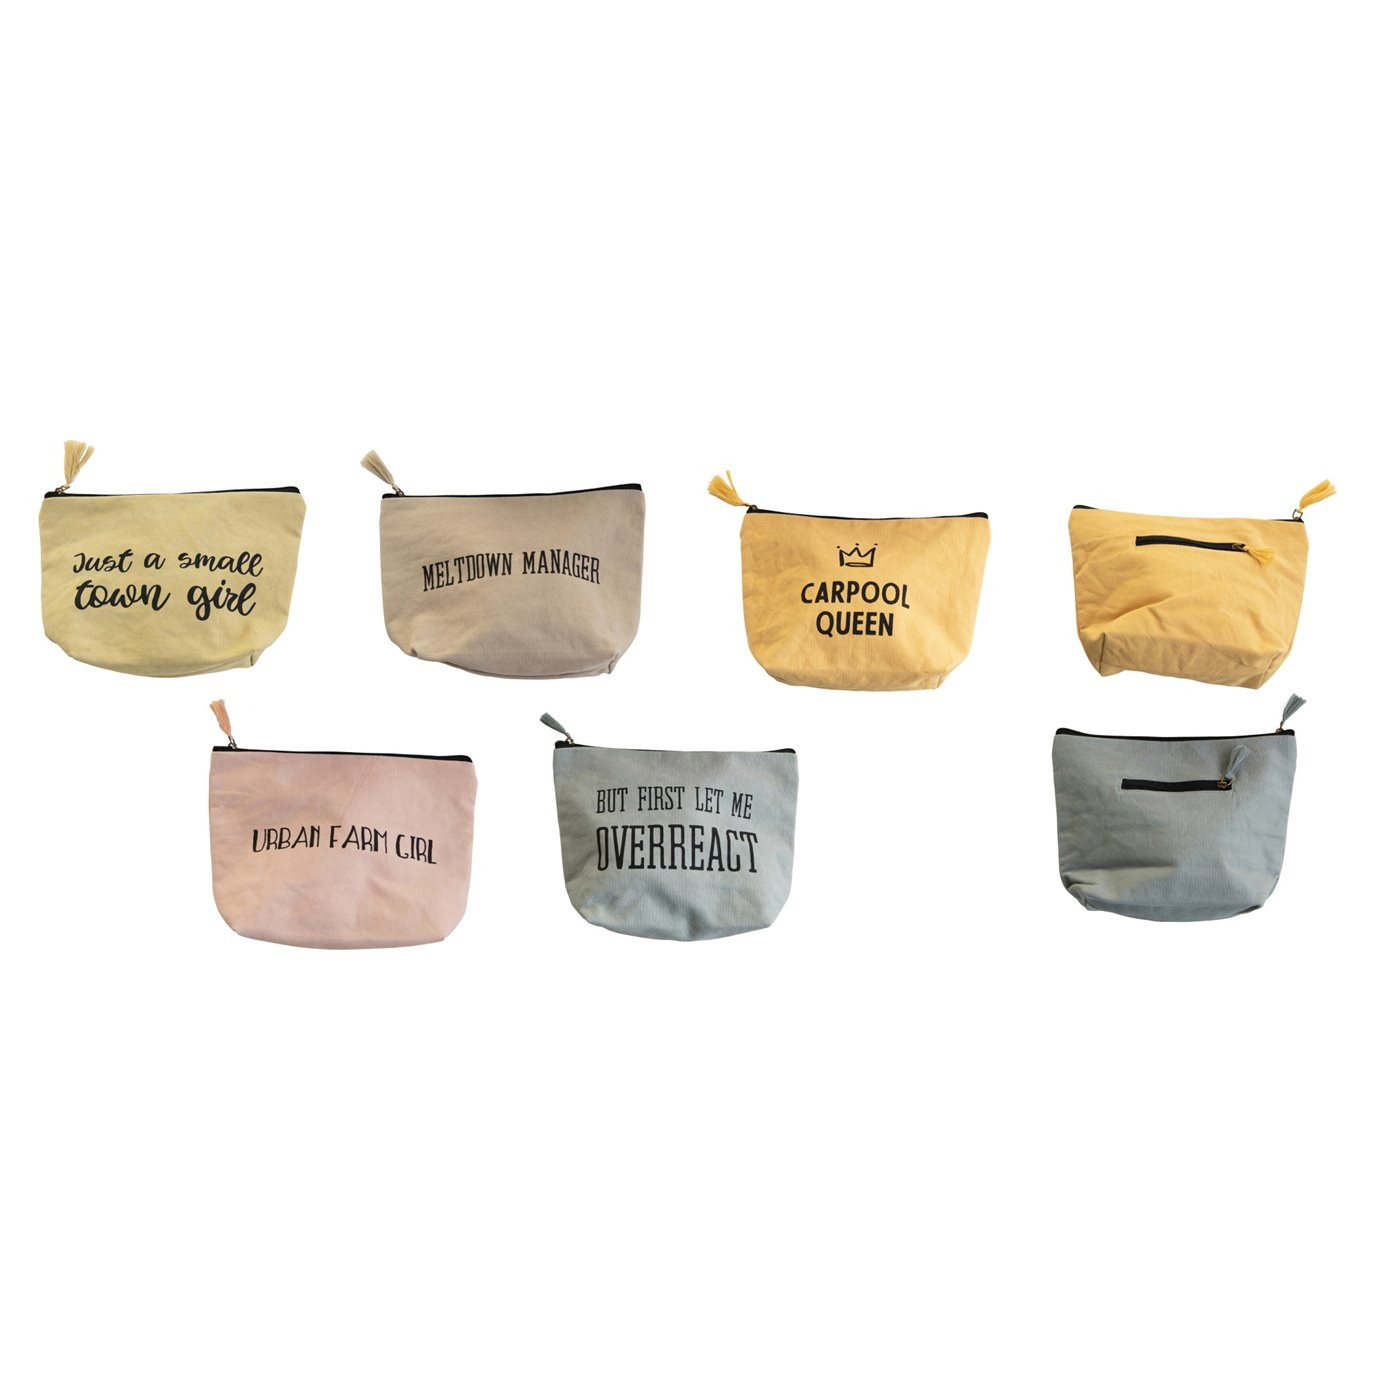 Stonewashed Cotton Canvas Adoni Zip Pouch w/ Back Pocket & Sayings, 5 Styles